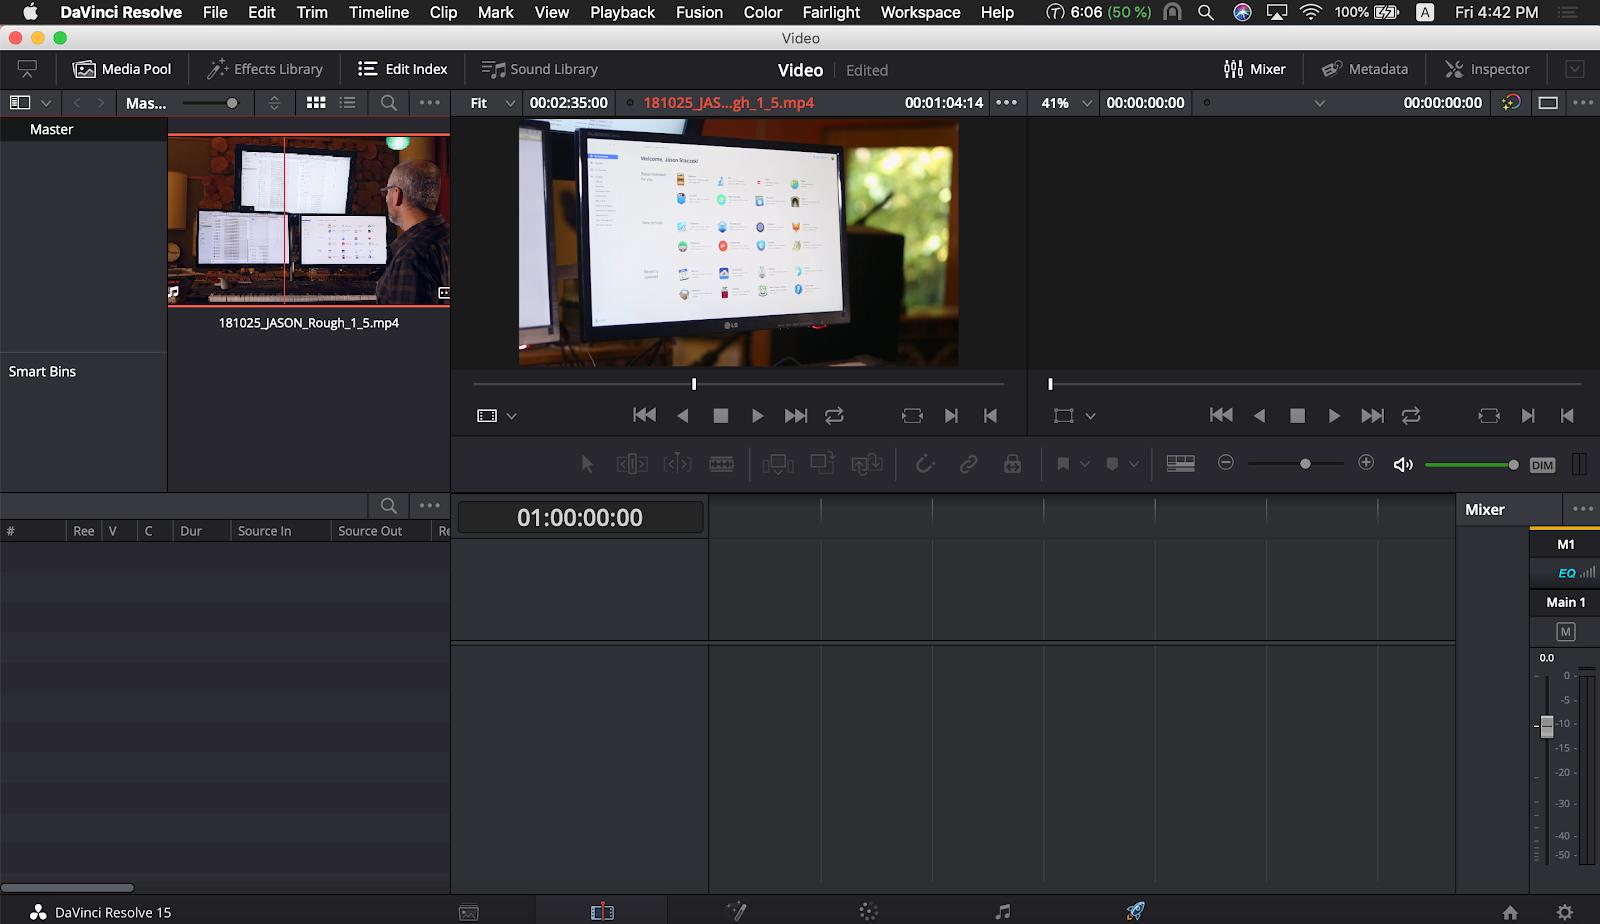 DaVinci video editing